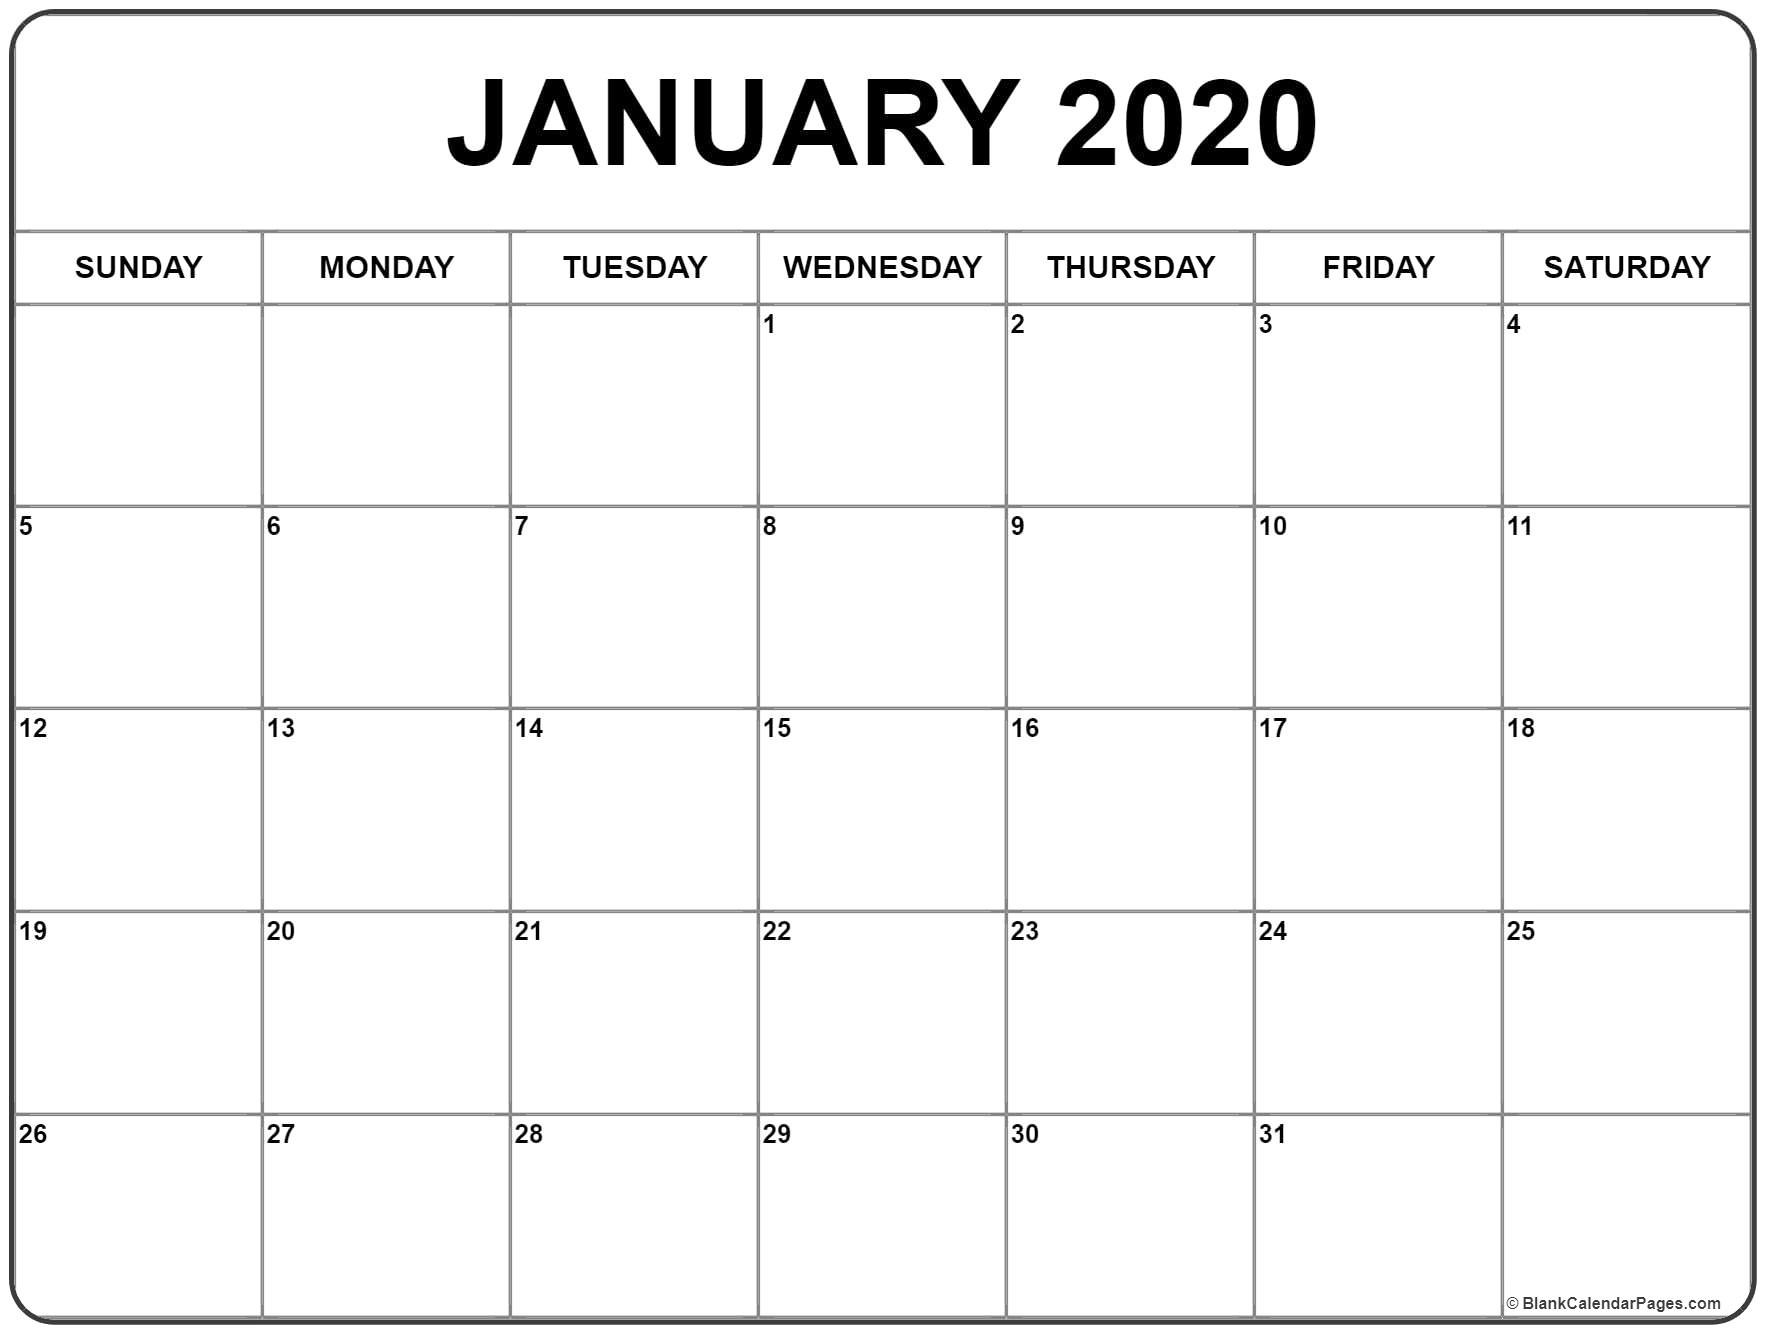 January 2020 Calendar B2 | Jcreview-January 2020 Lunar Calendar